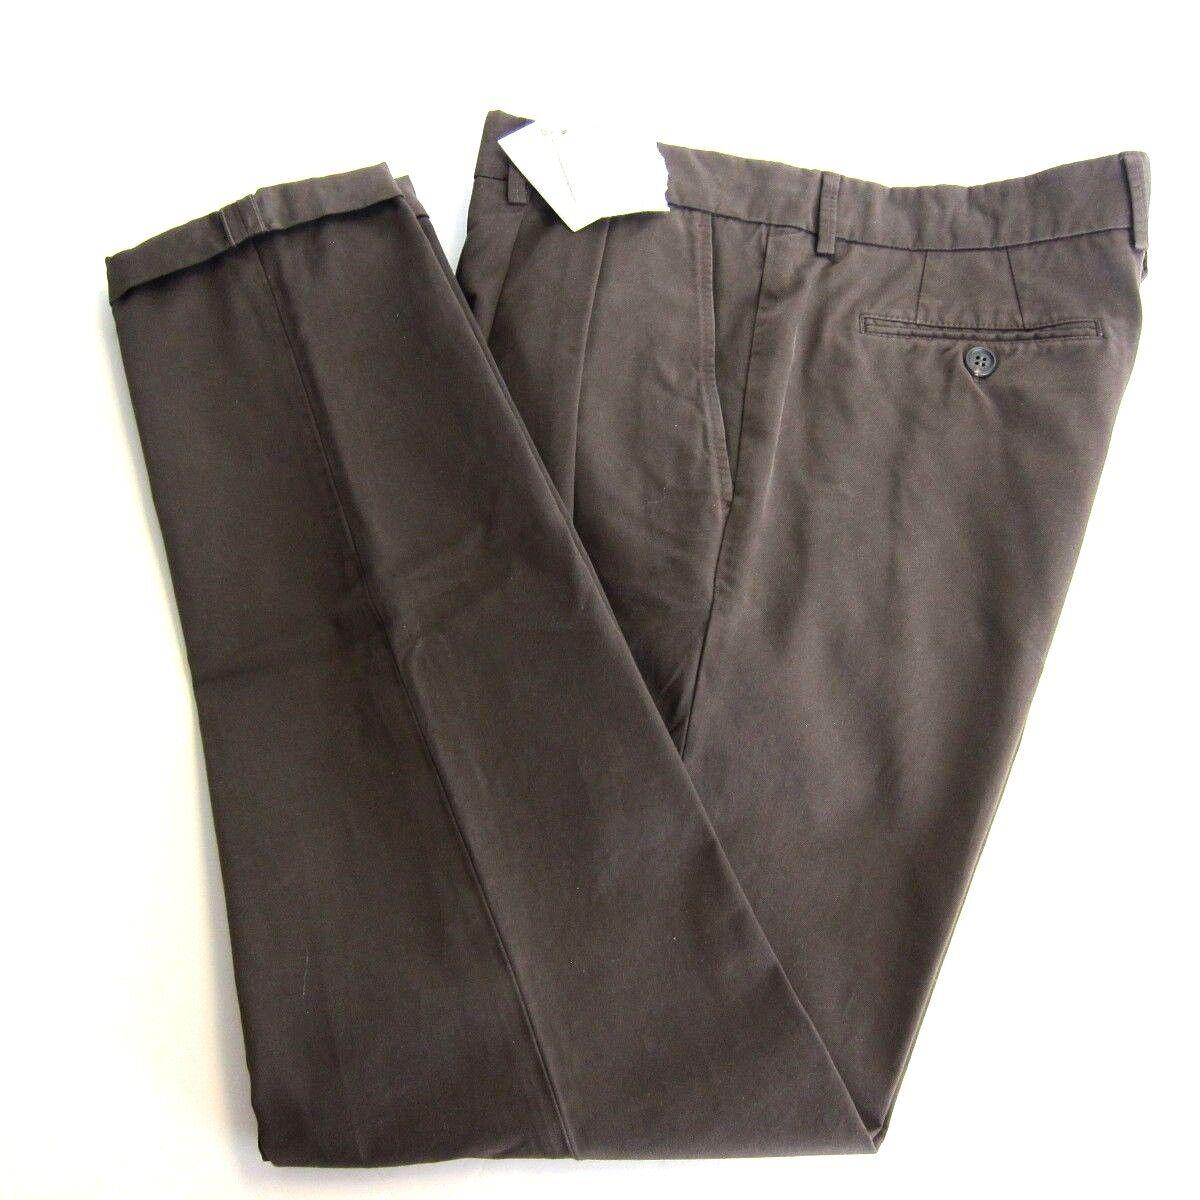 J-957138 New Brunello Cucinelli Brown Zip Front Gabardine Pants Size 54x33